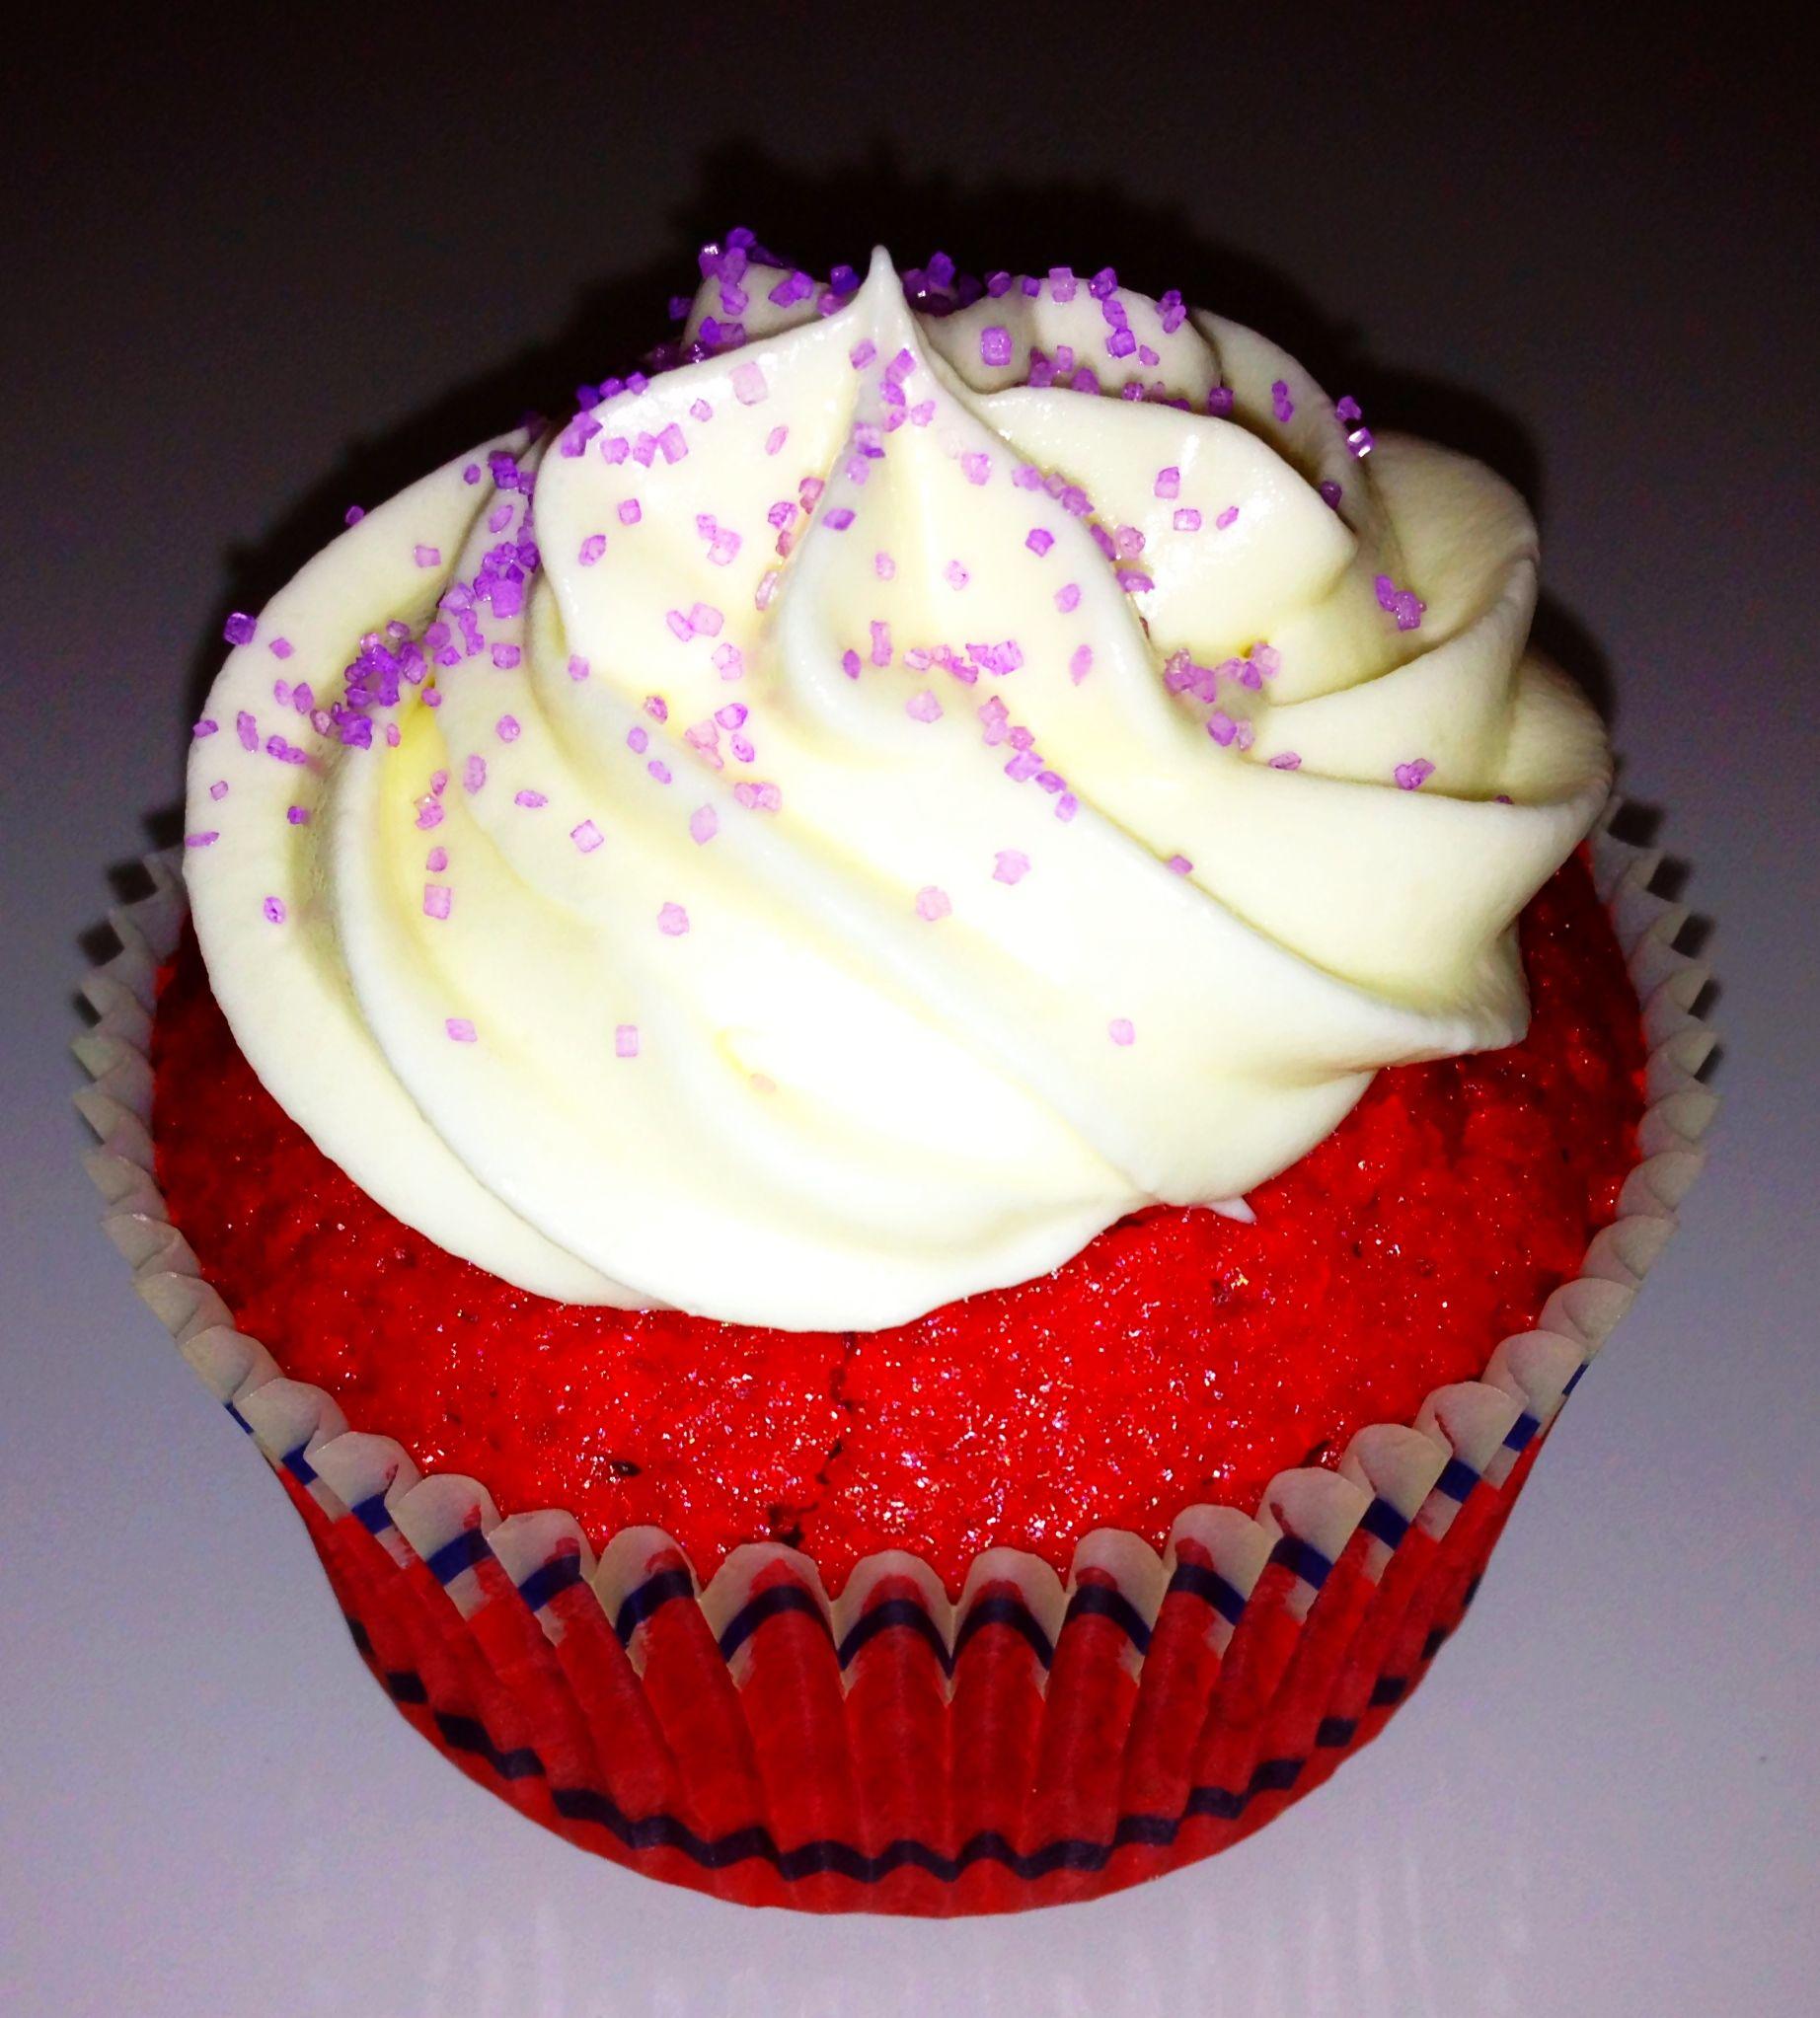 Red Velvet con Cream Cheese Buttercream. Pedido mínimo 6 uds. Llama al 618 19 27 57 o info@cuppingcakes.es